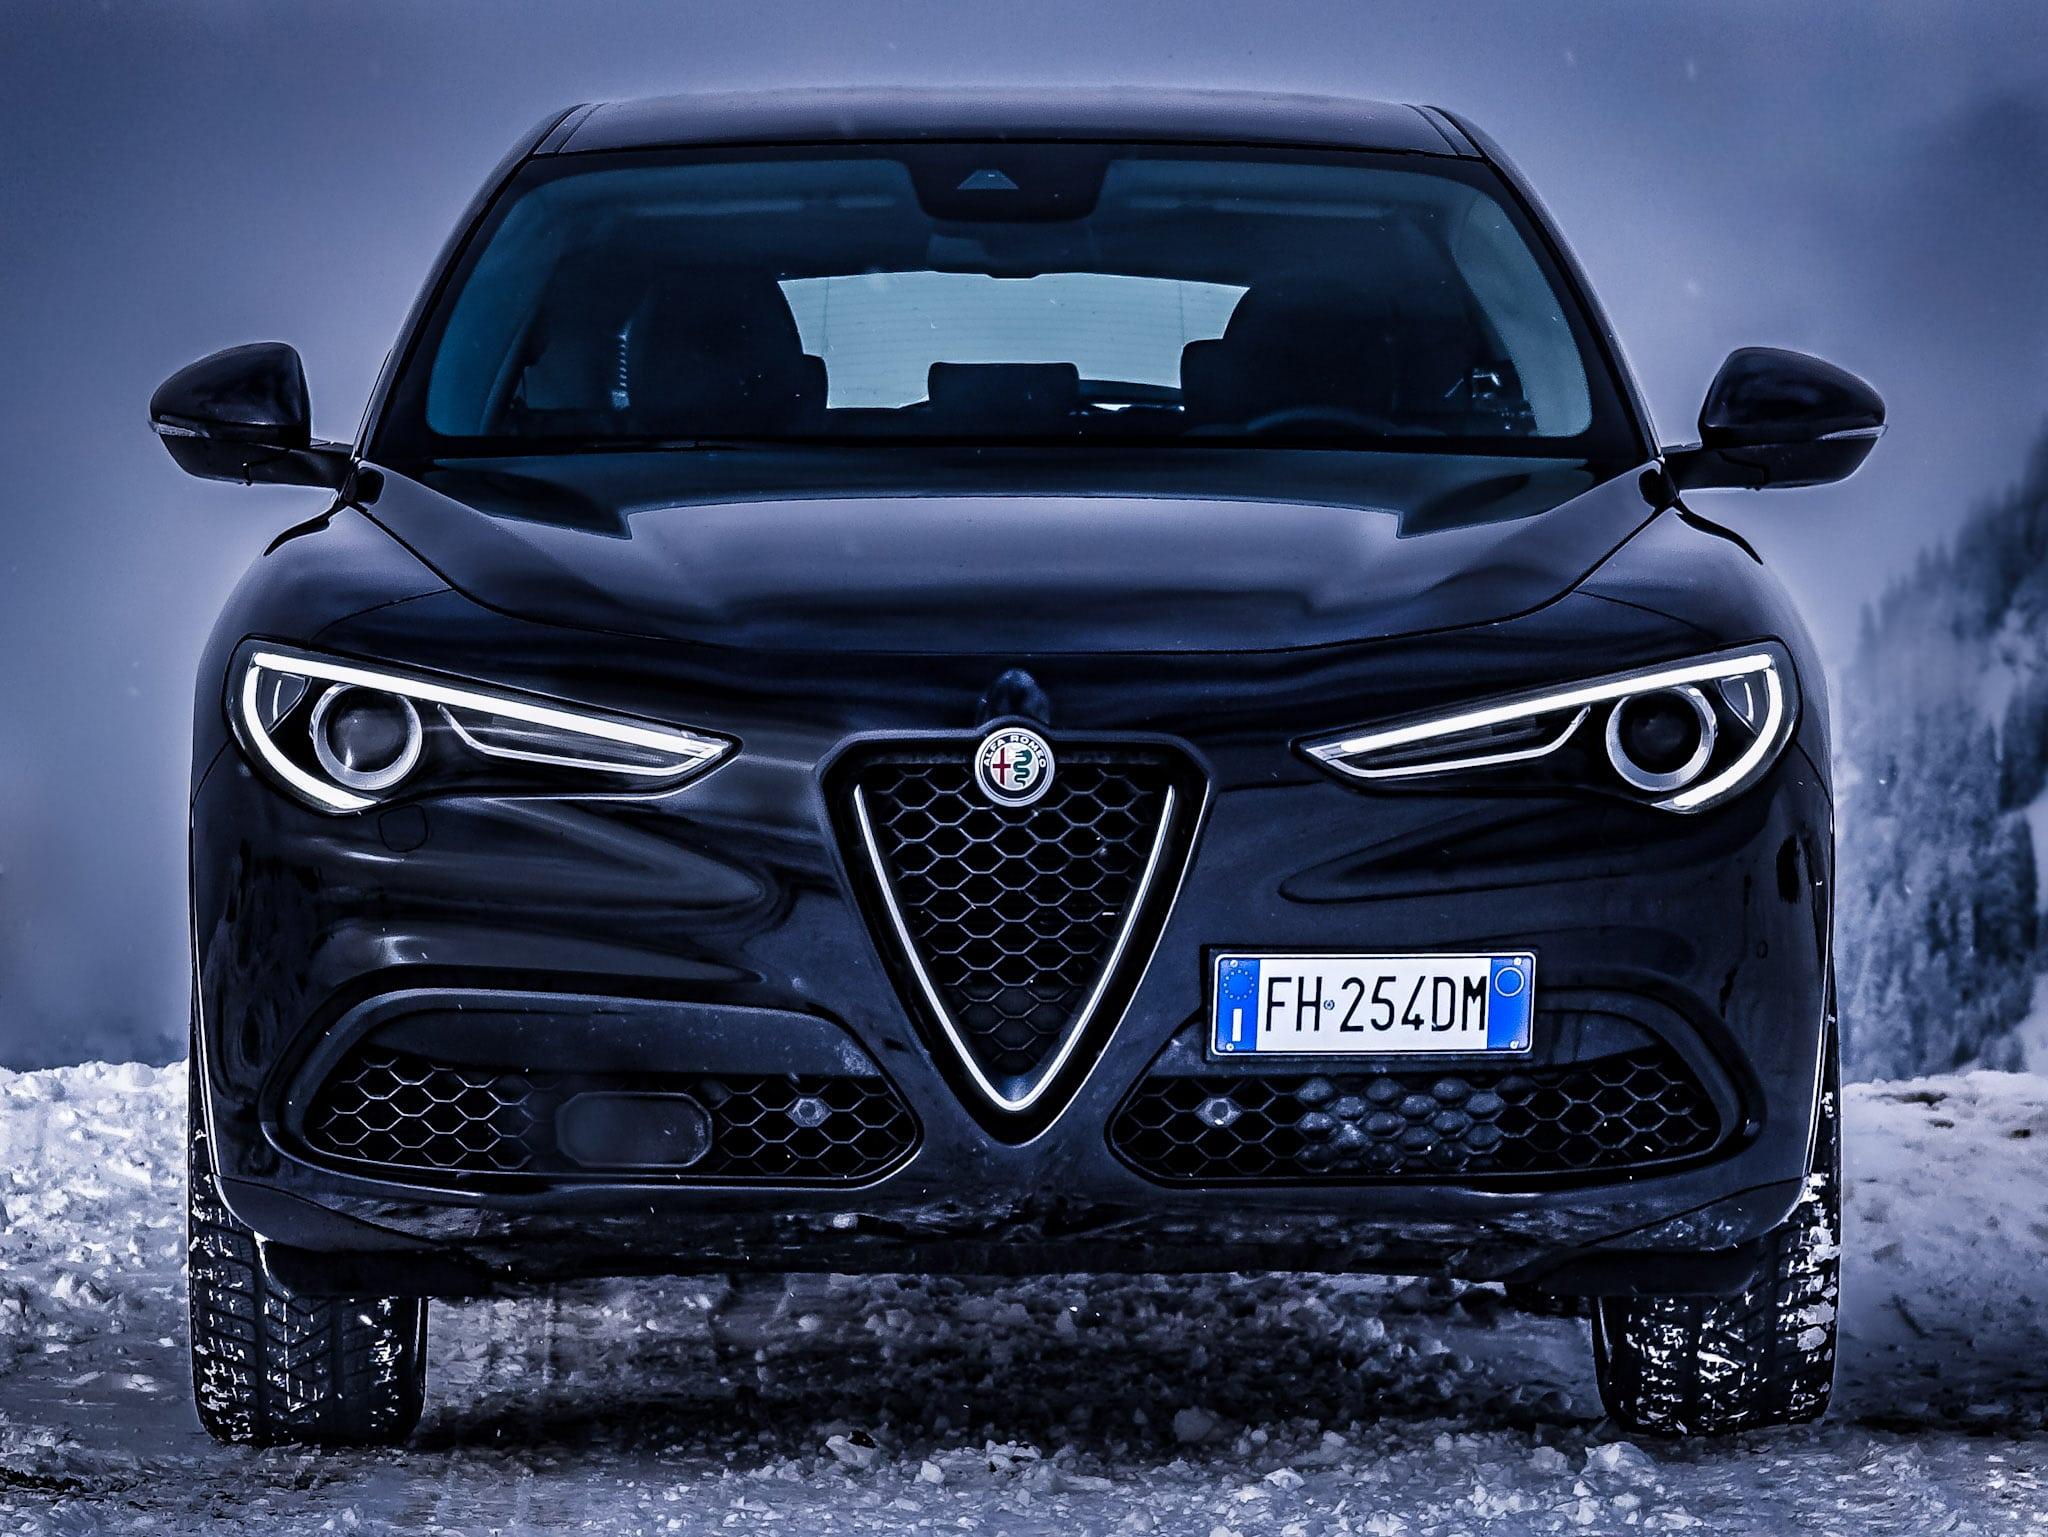 Blog – Alfa Romeo Stelvio (280hp) – #StelvioEmotions Roadtrip